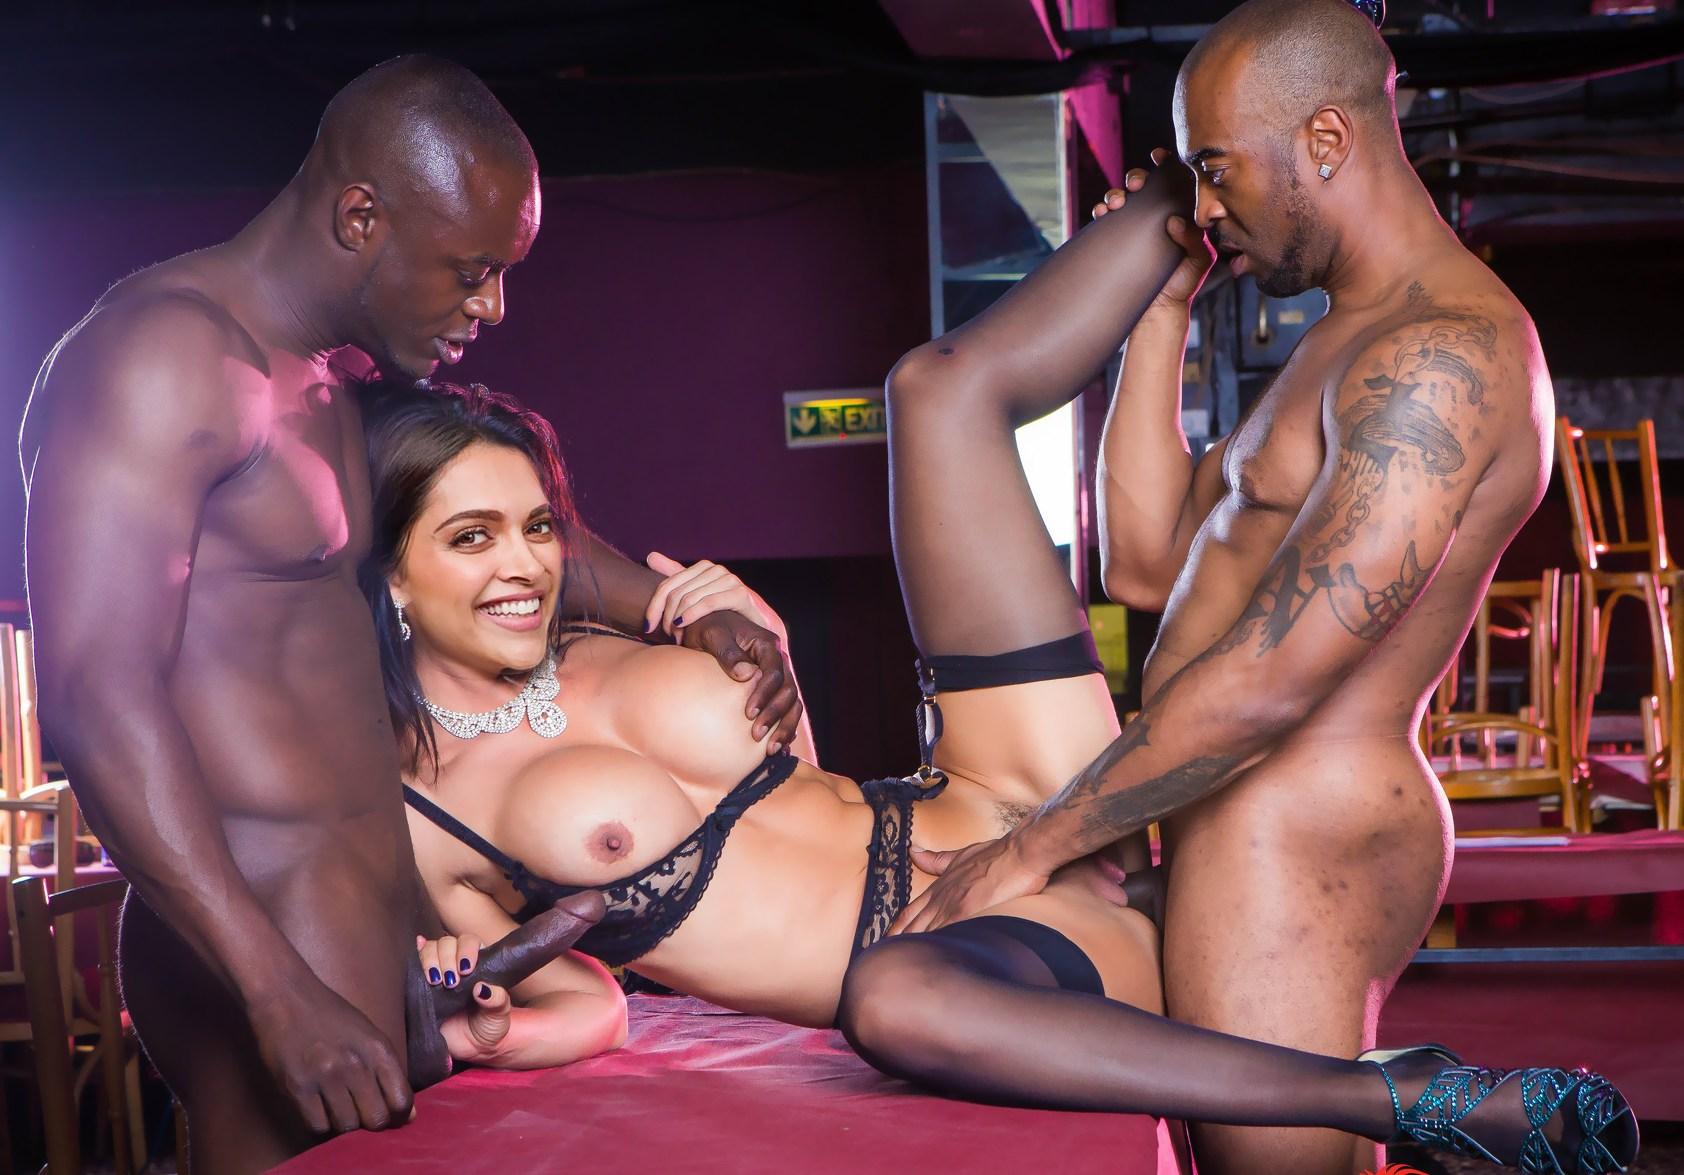 4 Jpg Porn deepika padukone nude fake fucking threesome hd porn nangi